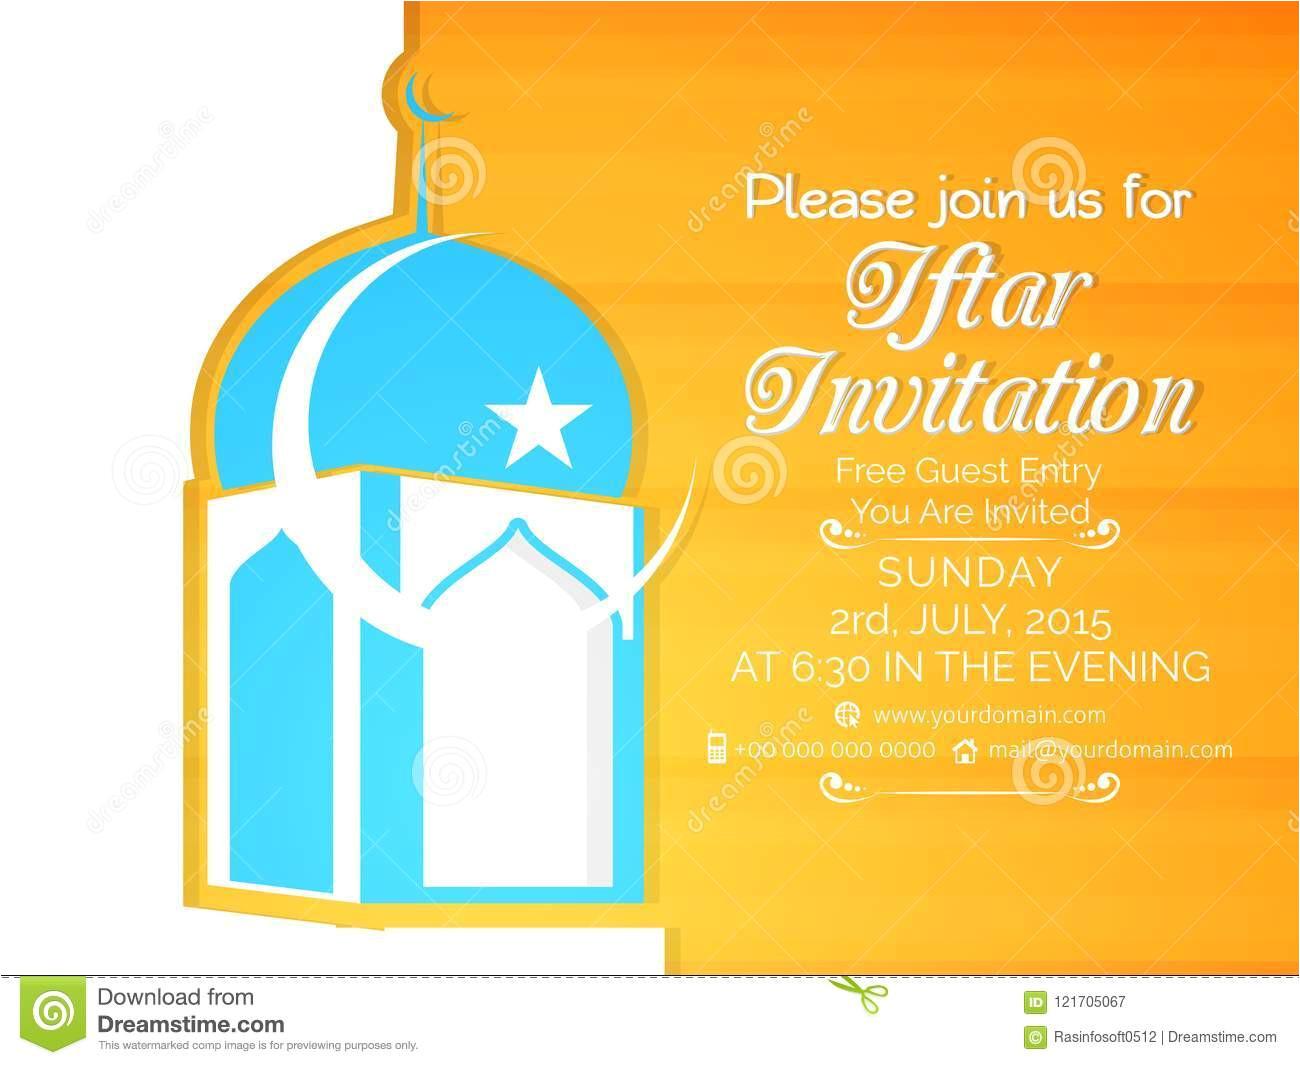 iftar invitation eid mubarak ramadan mubarak eid al fitr nice beautiful invitation poster eid iftar party 121705067 jpg